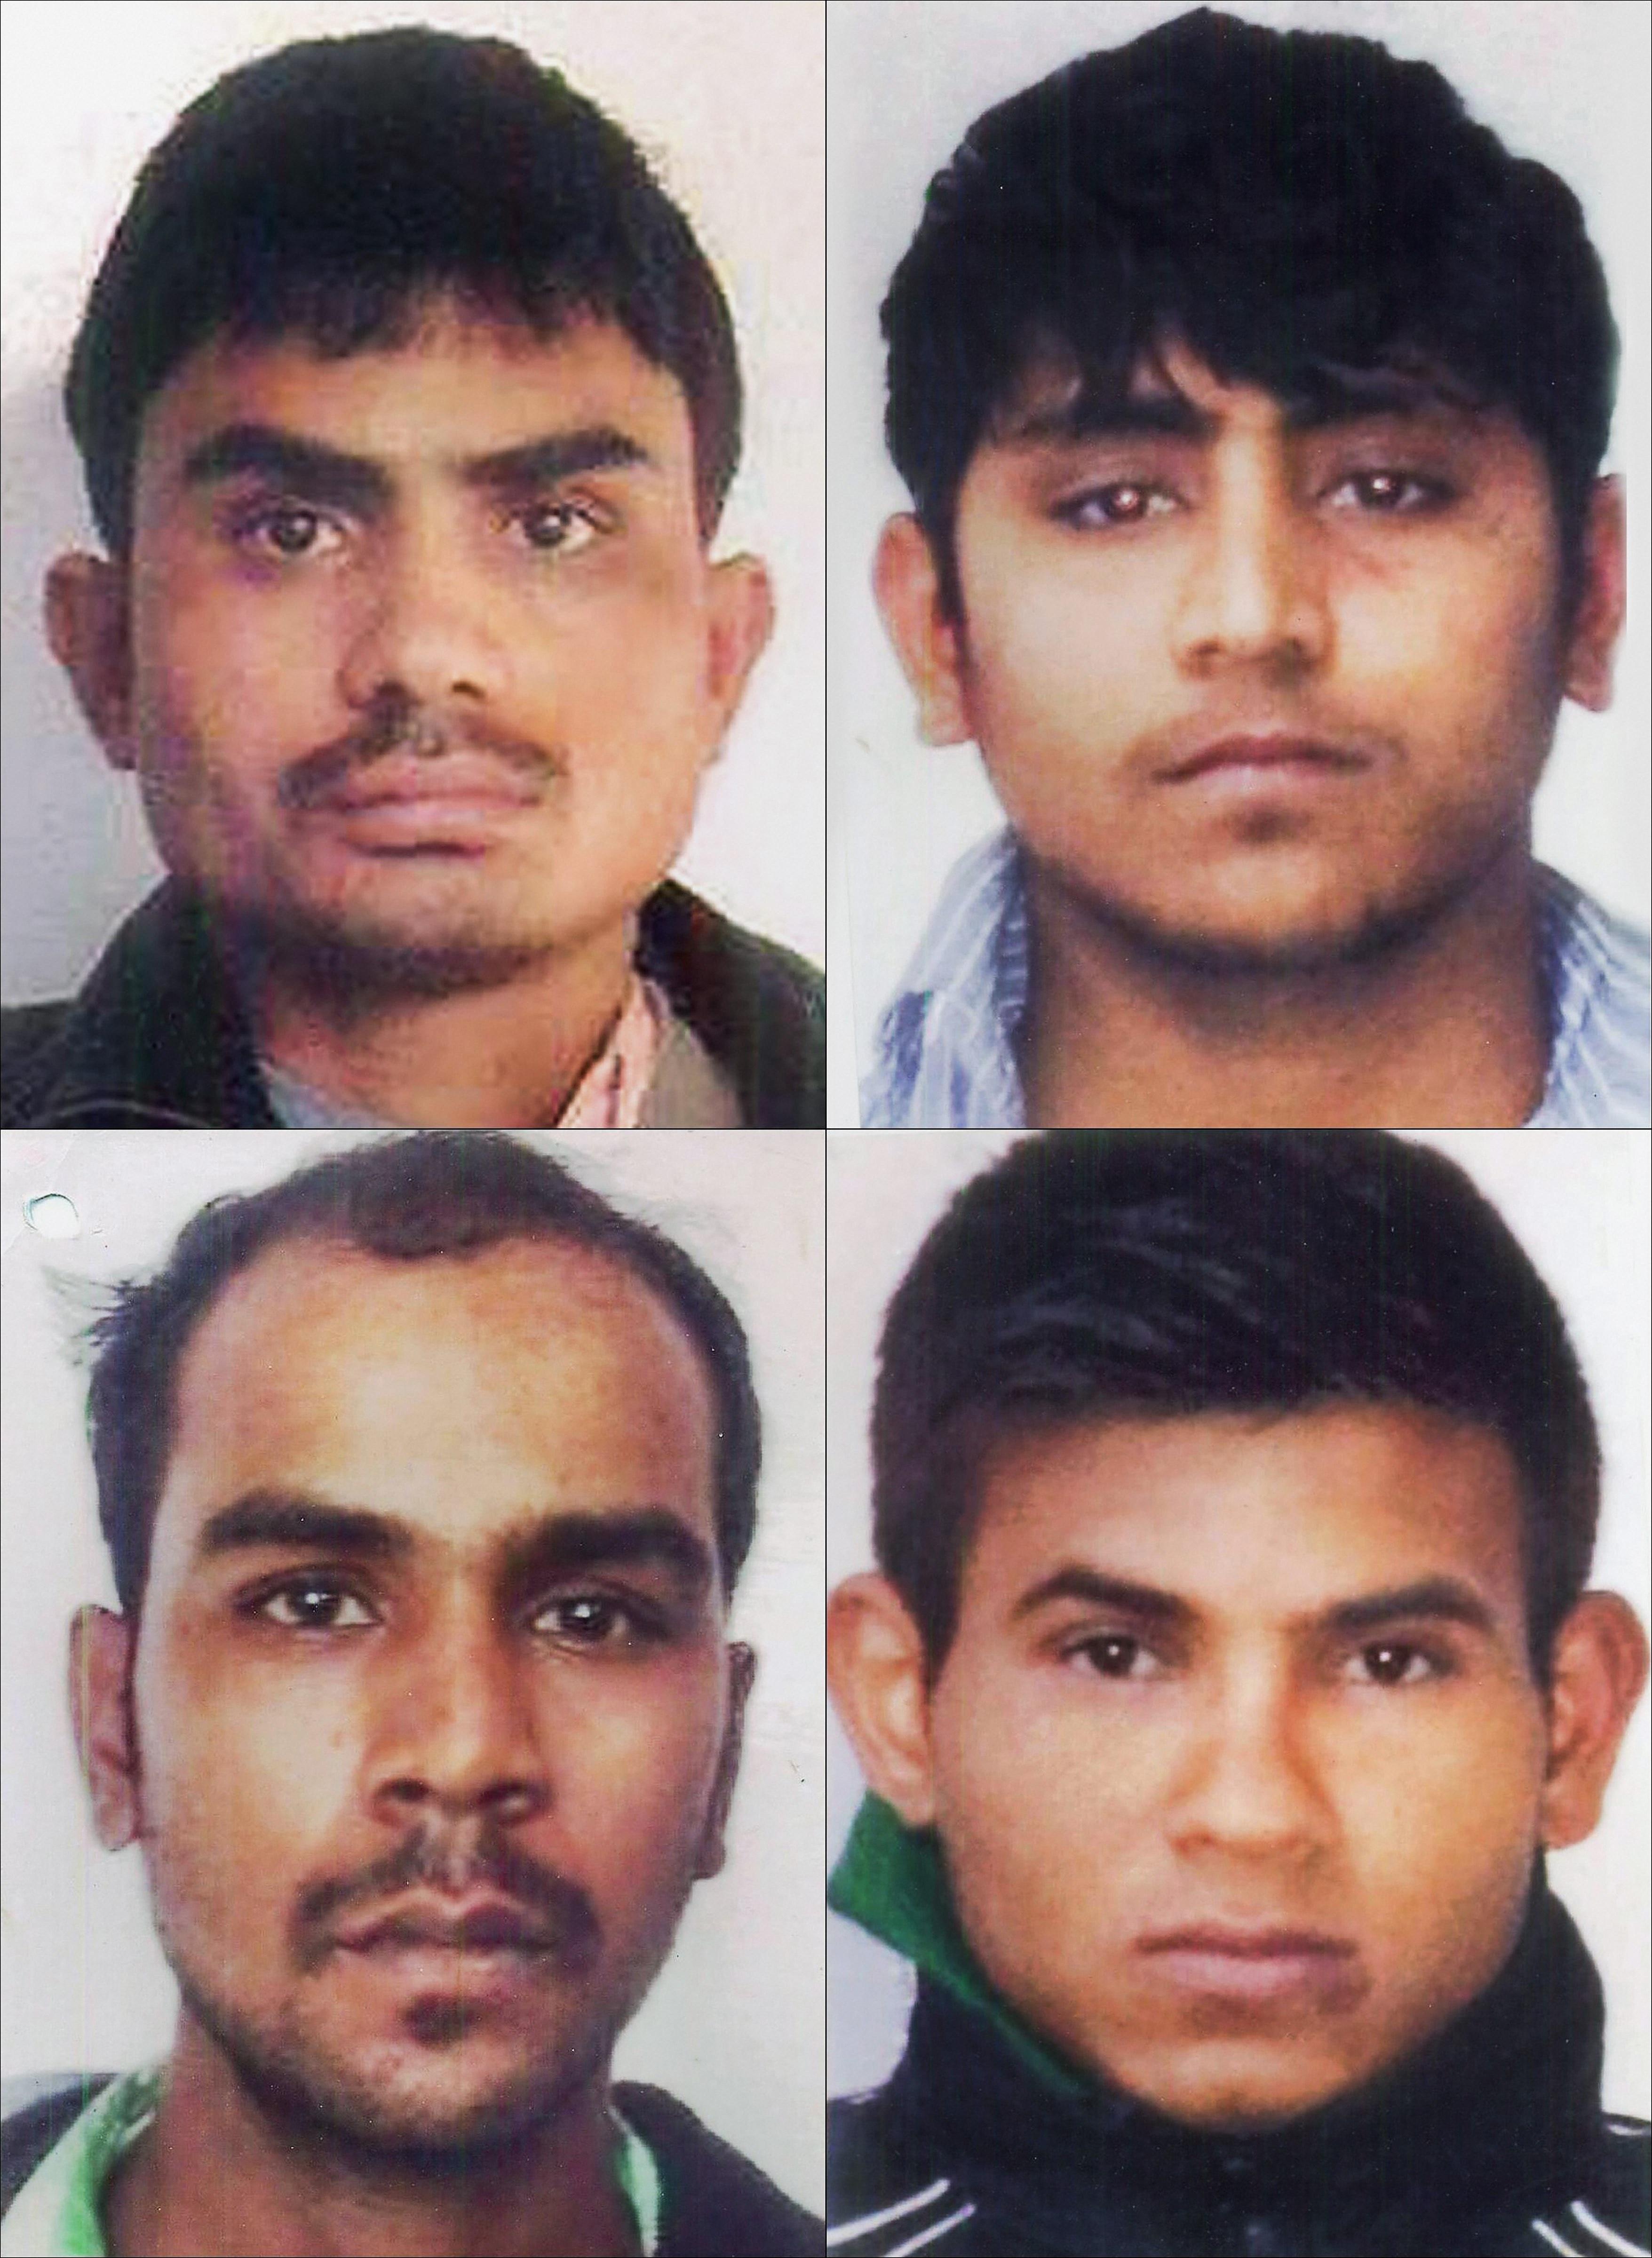 2012 Delhi gang rape case convicts, clockwise from top left, Akshay Thakur, Pawan Gupta, Vinay Sharma, and Mukesh Singh.